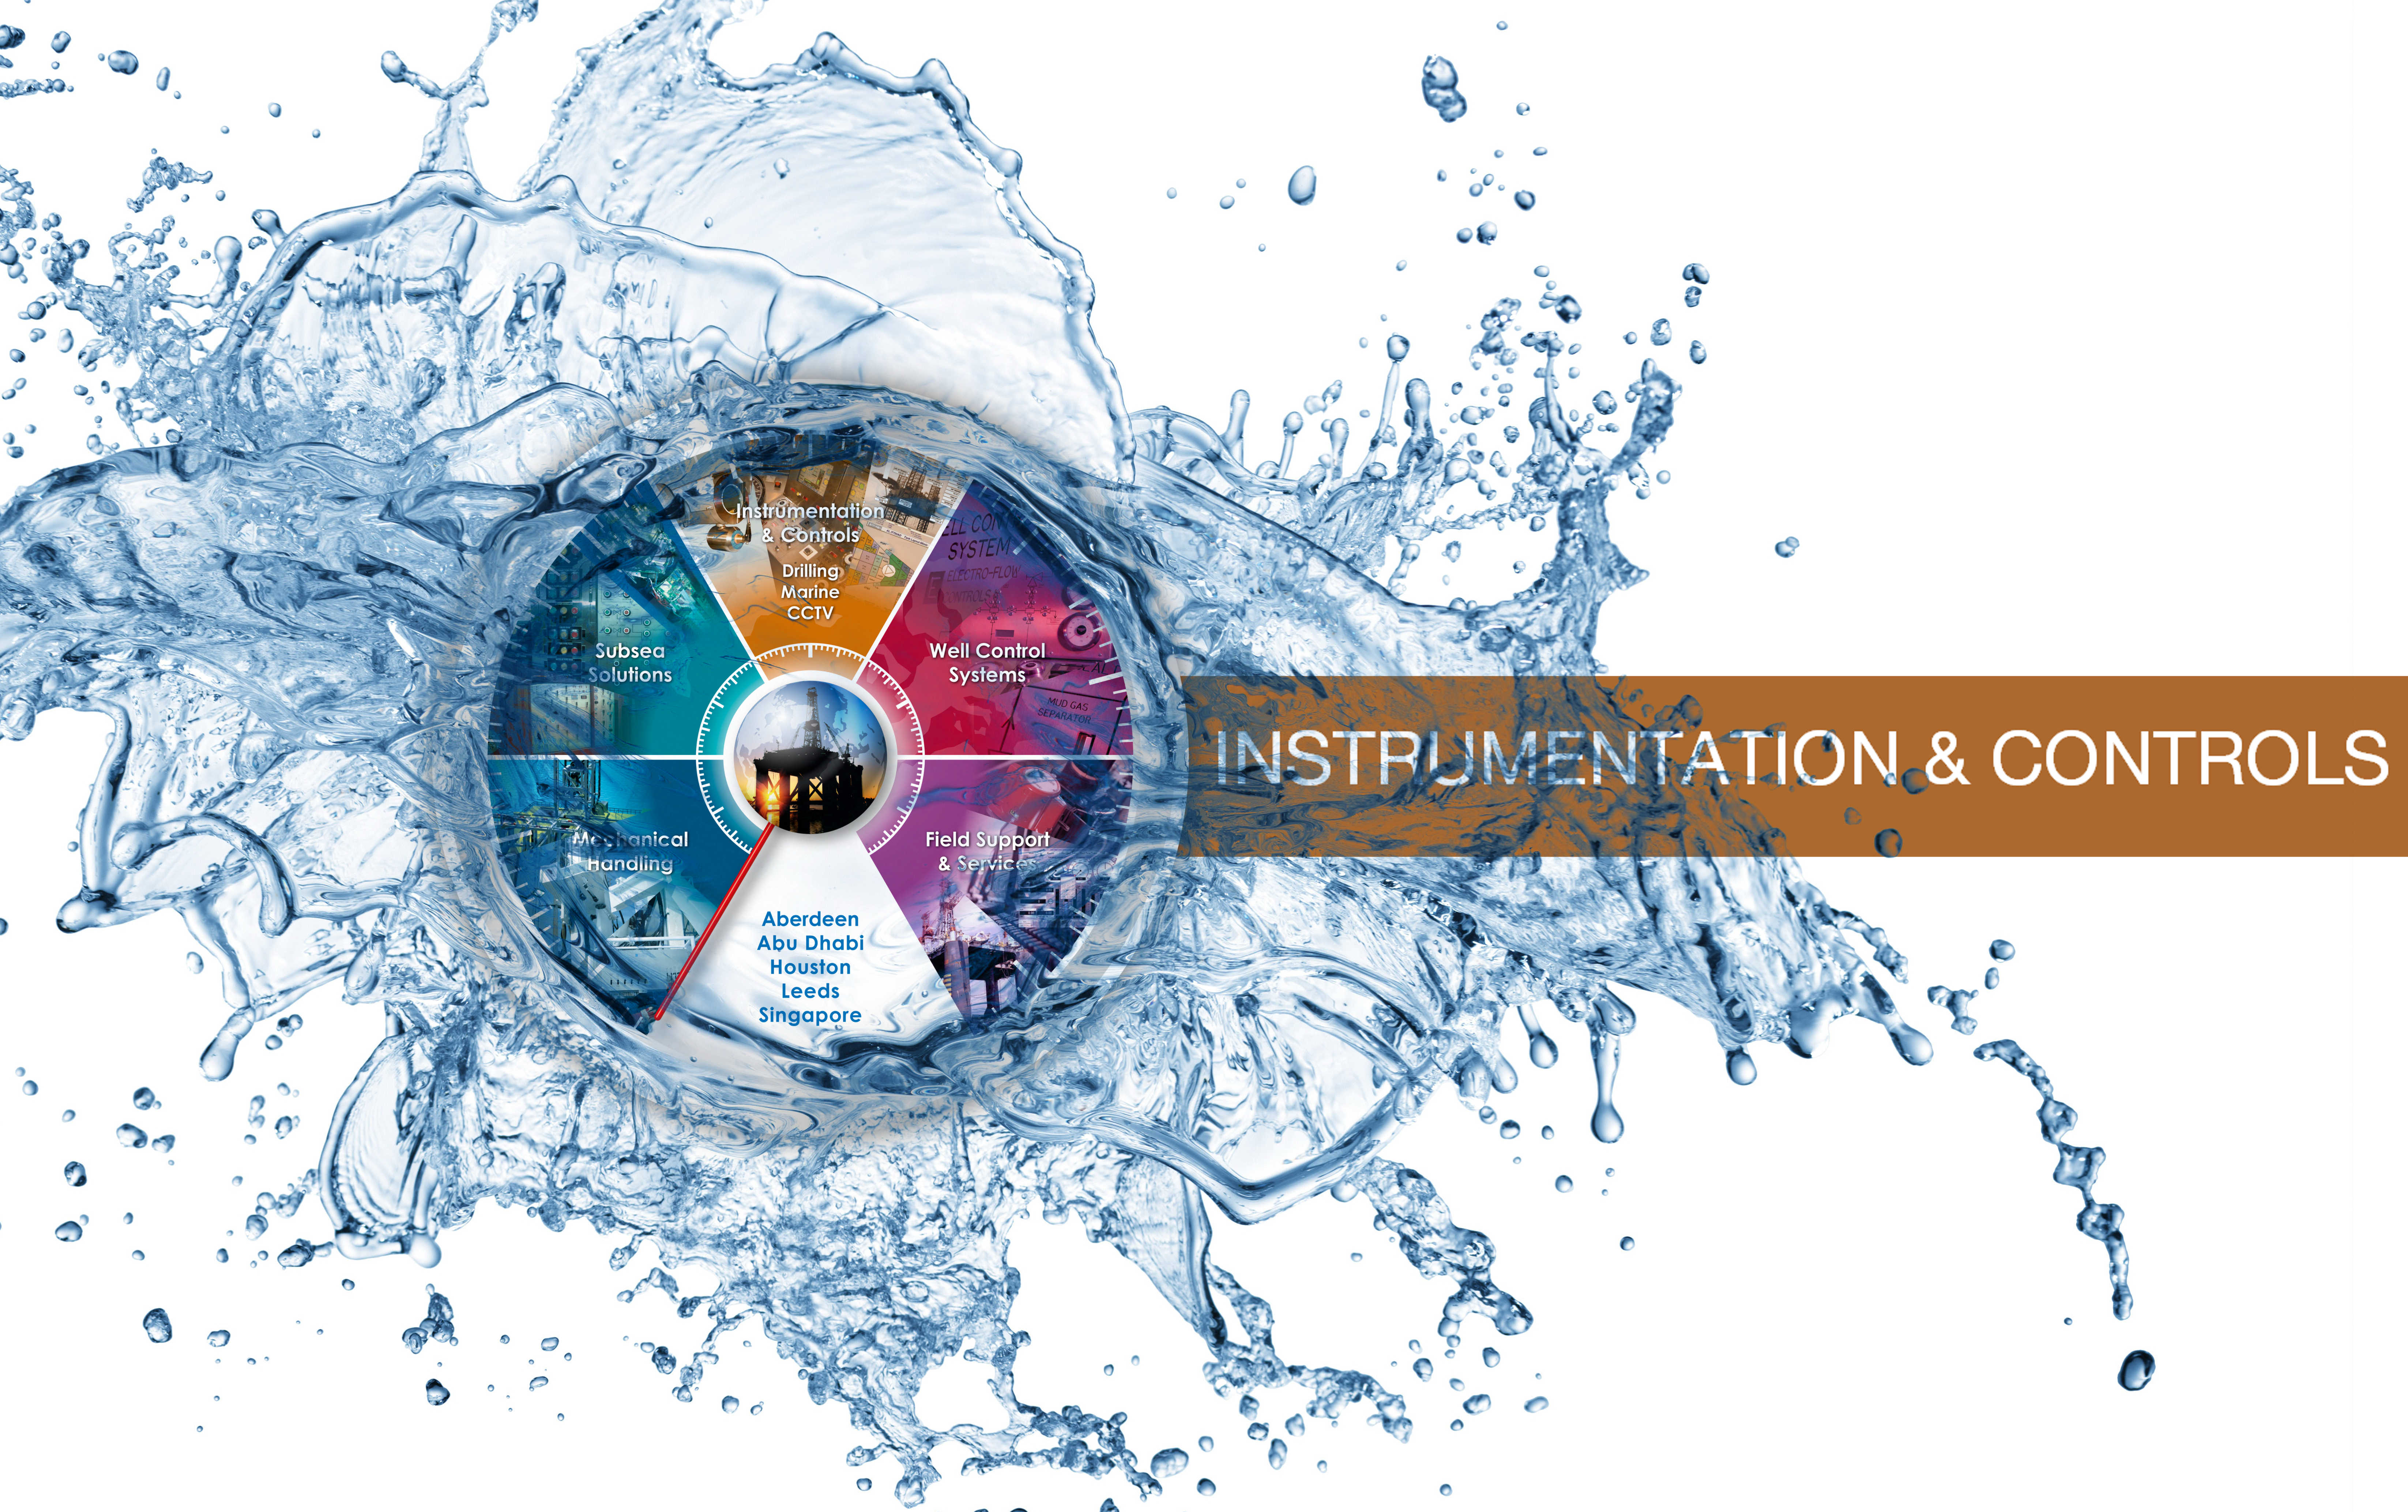 Instrumentation and Controls